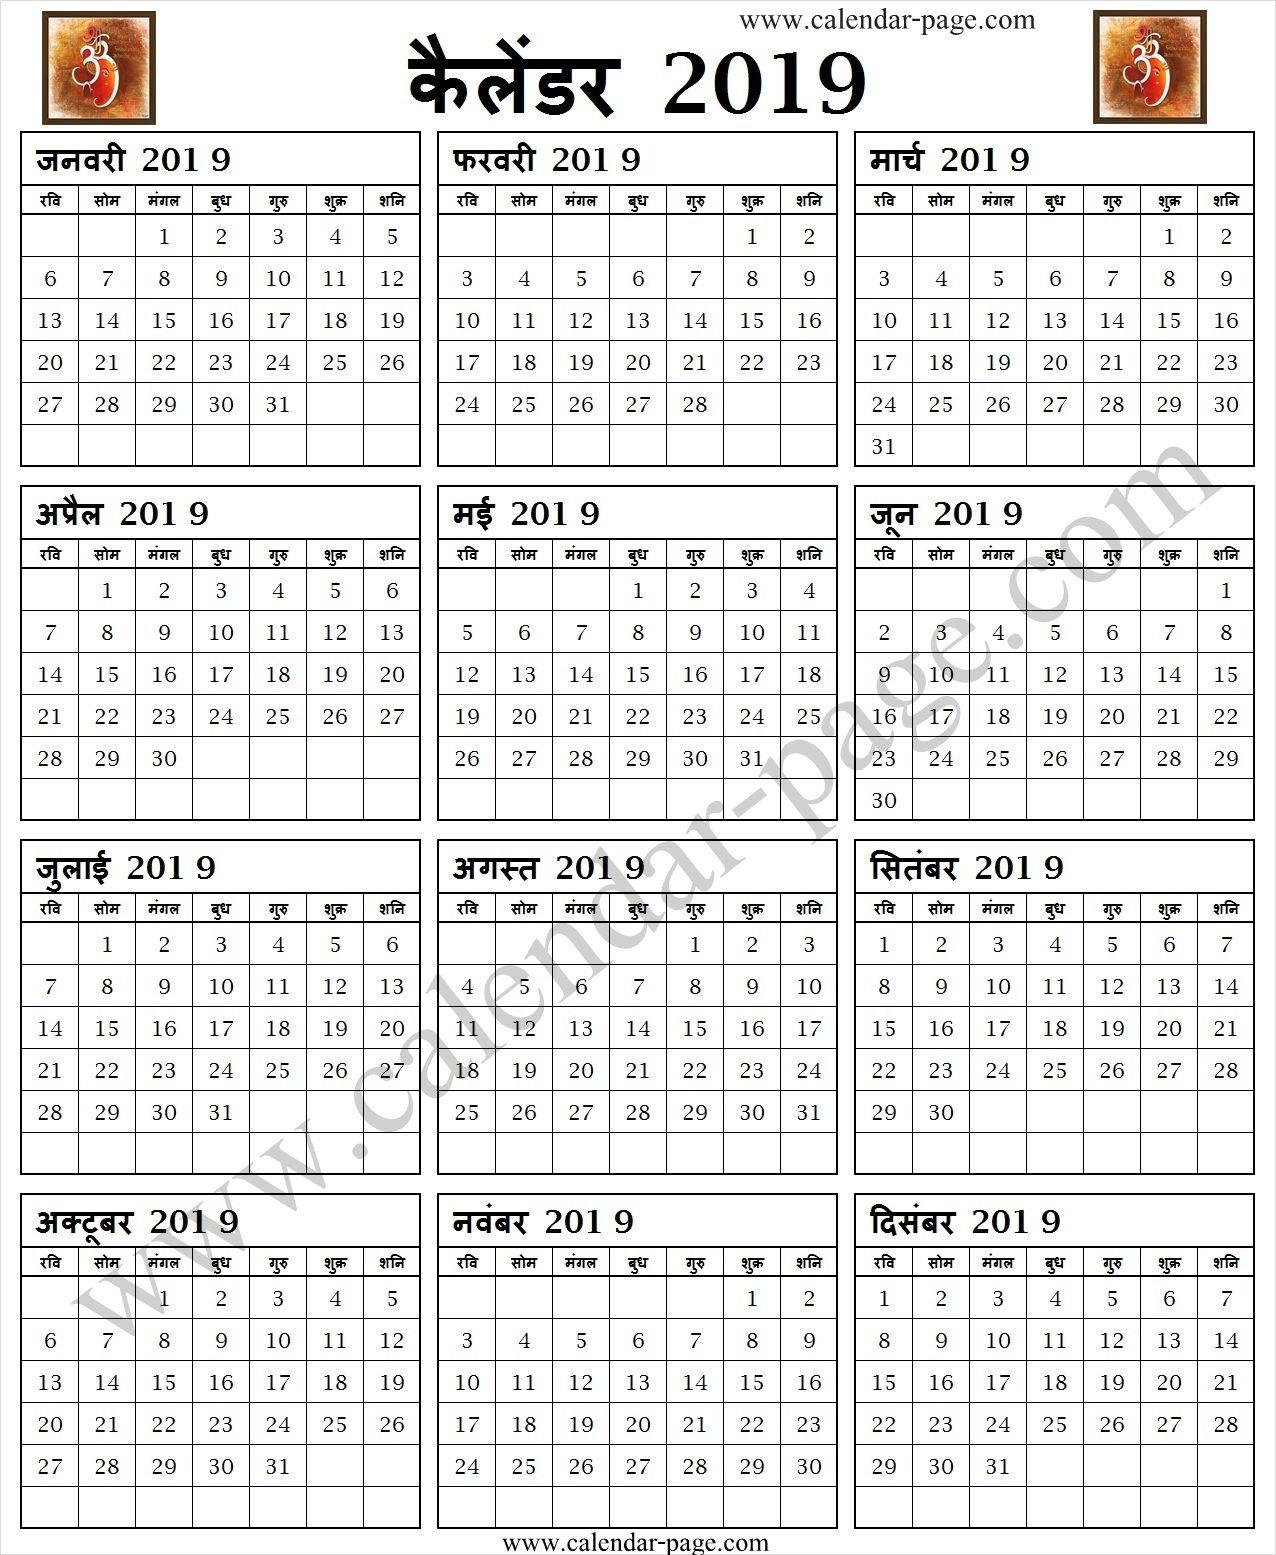 2019 Hindu Calendar In Hindi   2019 Free Calendar To Print   2019 Calendar 2019 Hindi